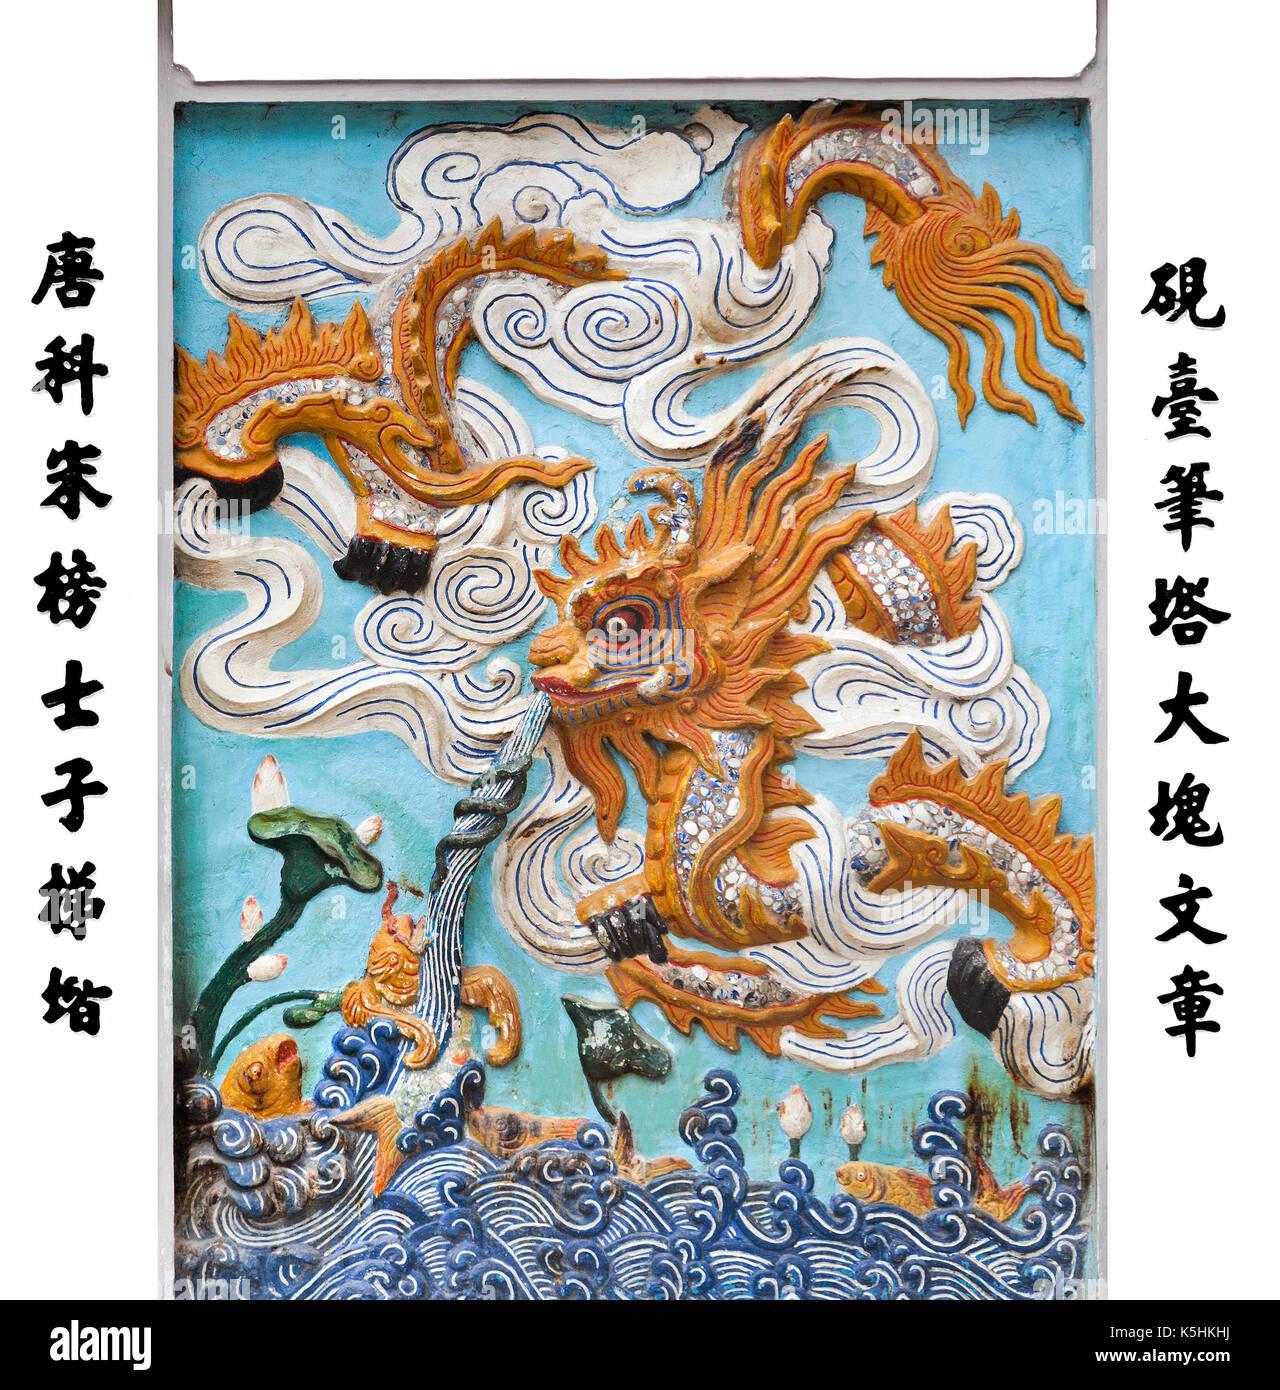 Dragon, fish, wall sculpture, Temple of the Jade Mountain (Ngoc Son Temple), Jade island, Hanoi, Vietnam - Stock Image